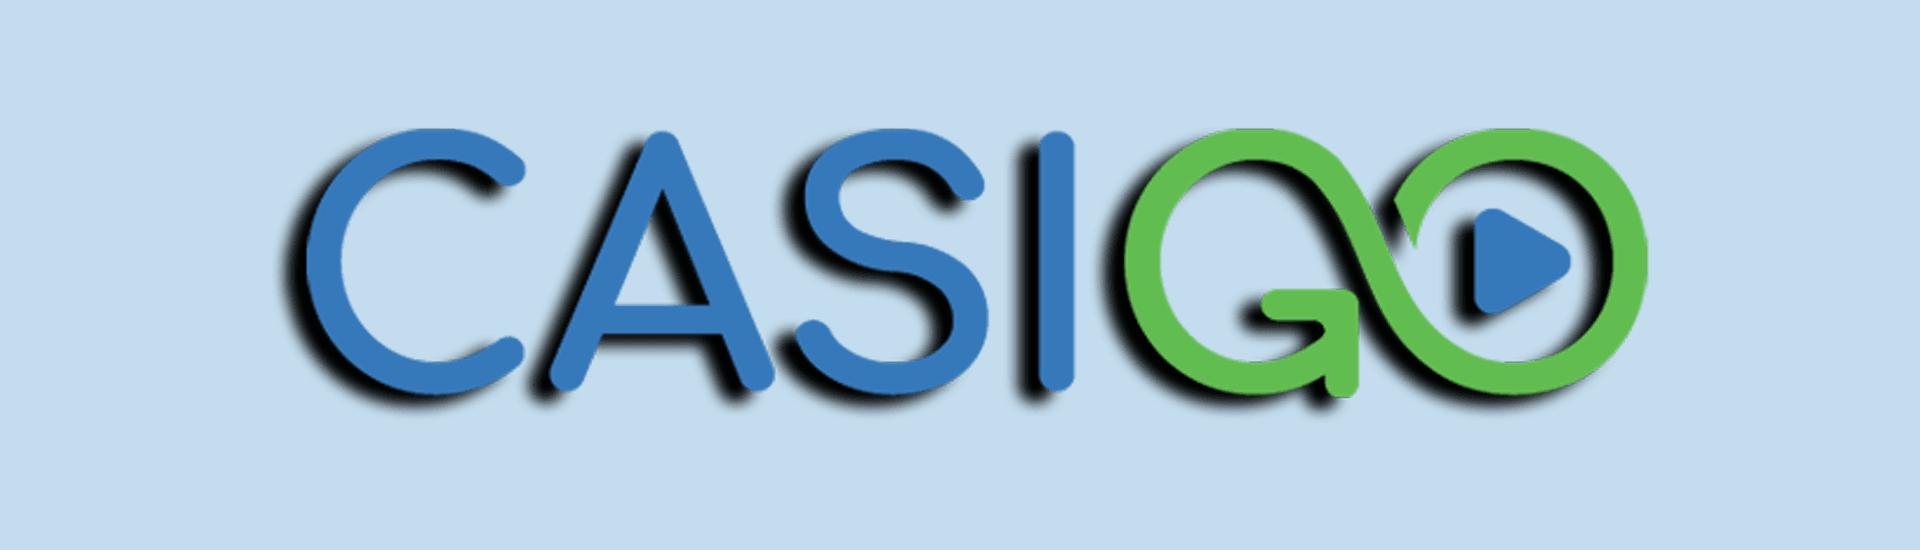 CasiGO Featured Image